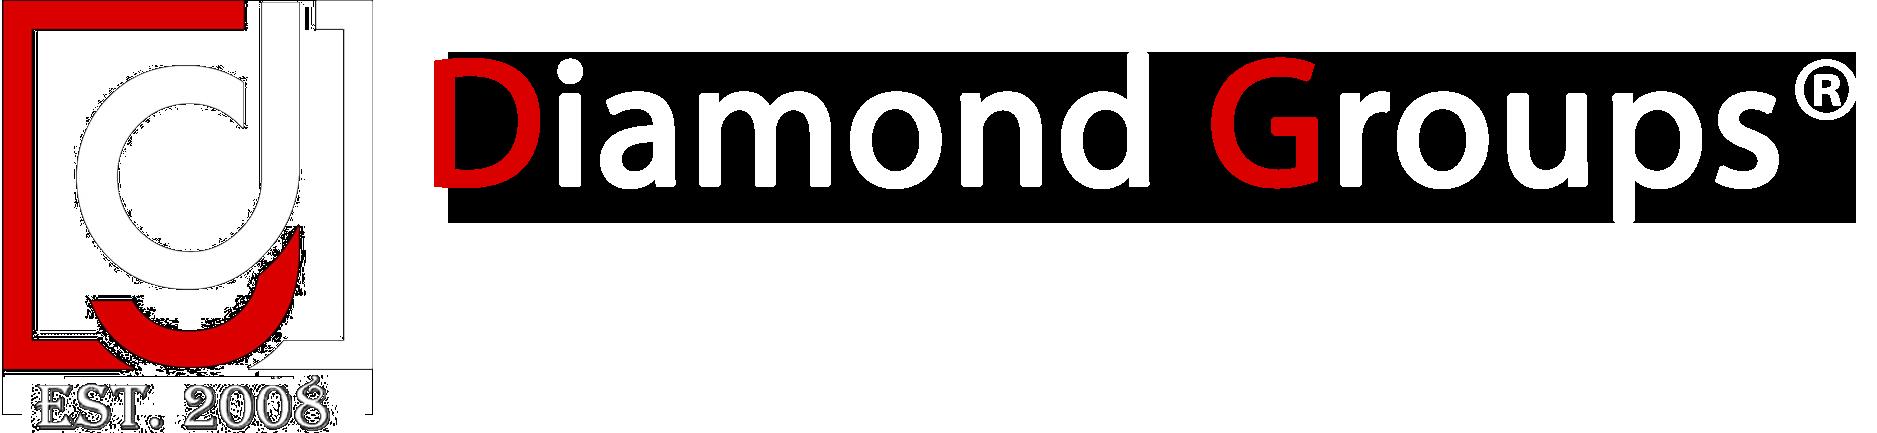 DIAMOND GROUPS EDUCATION CONSULTANTS PTY LTD